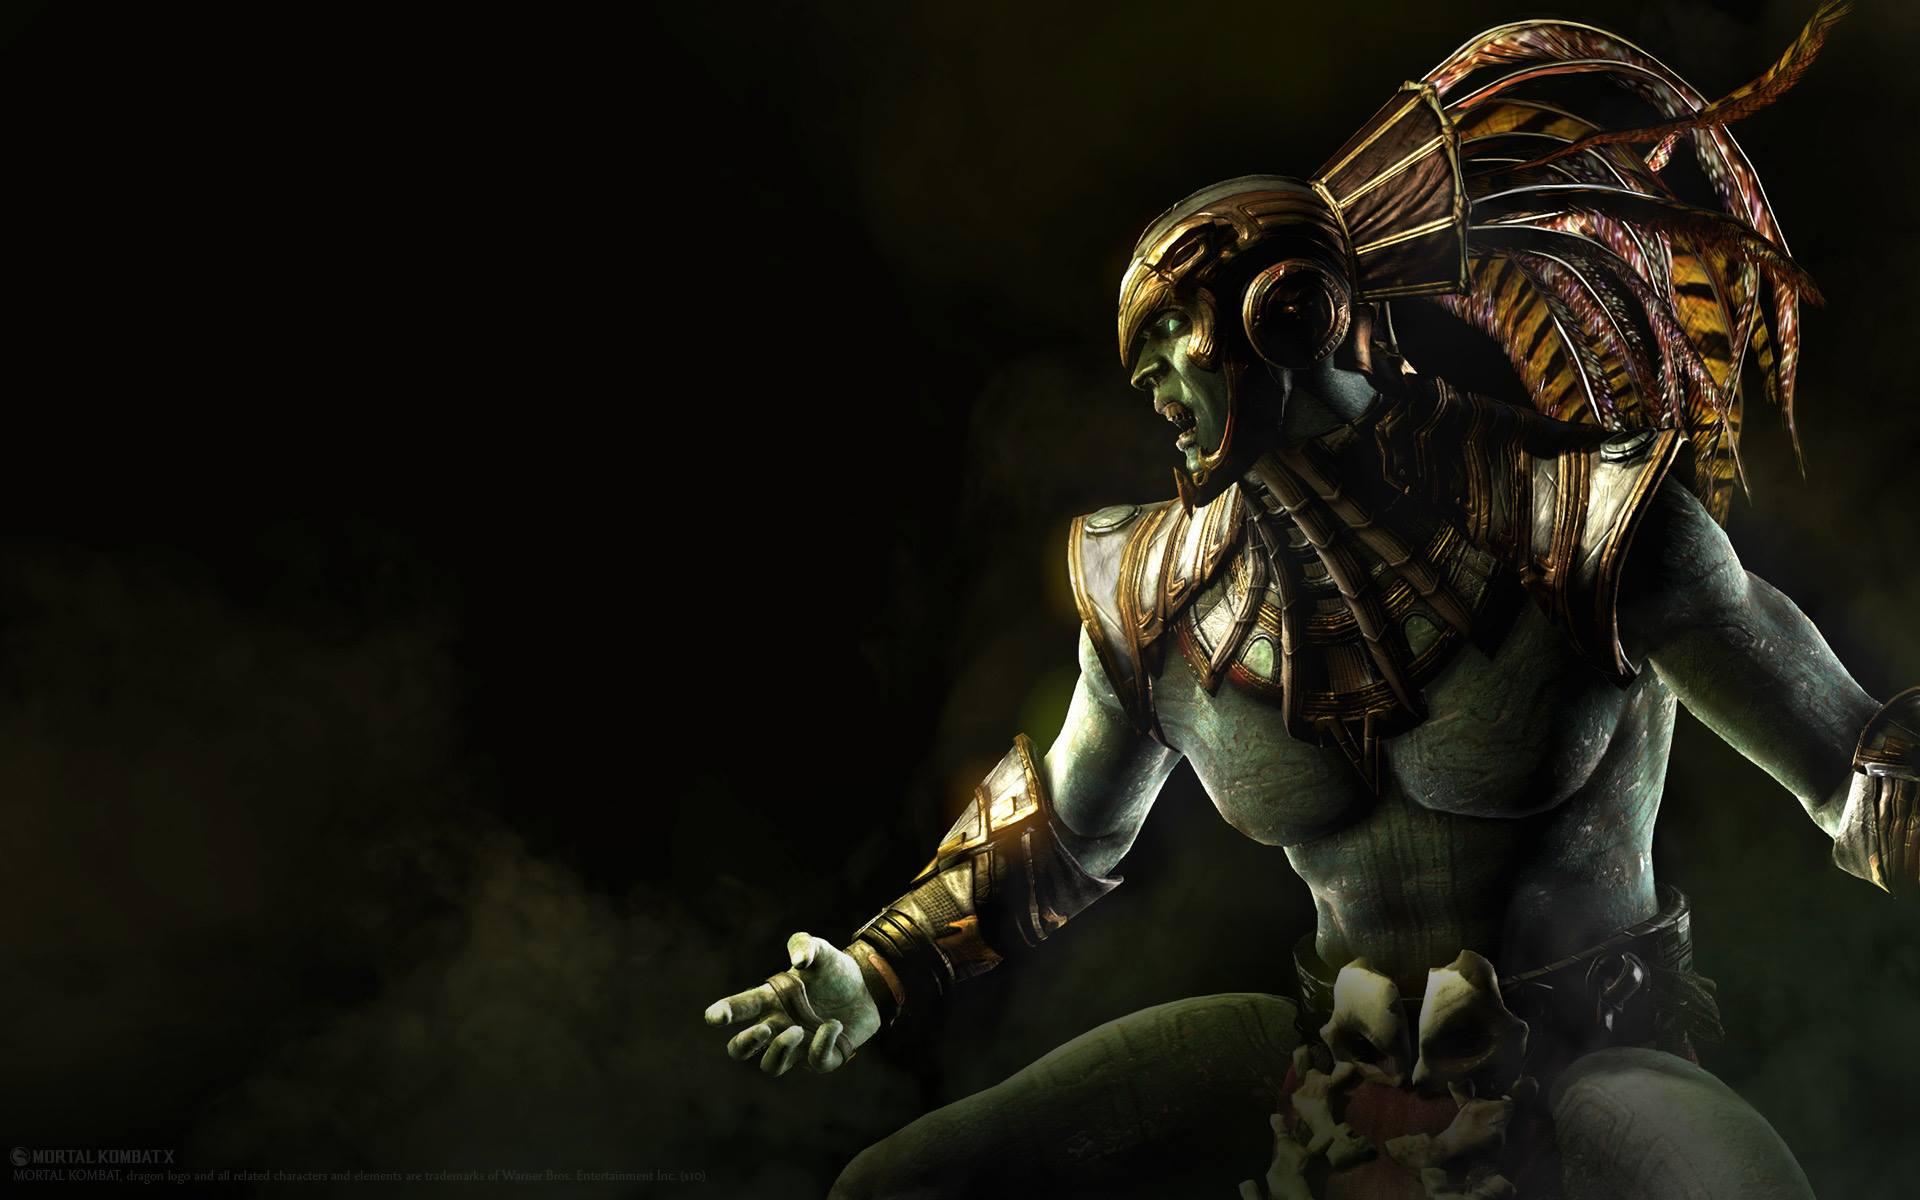 Wallpaper Soldier Mortal Kombat X Kotal Kahn Darkness